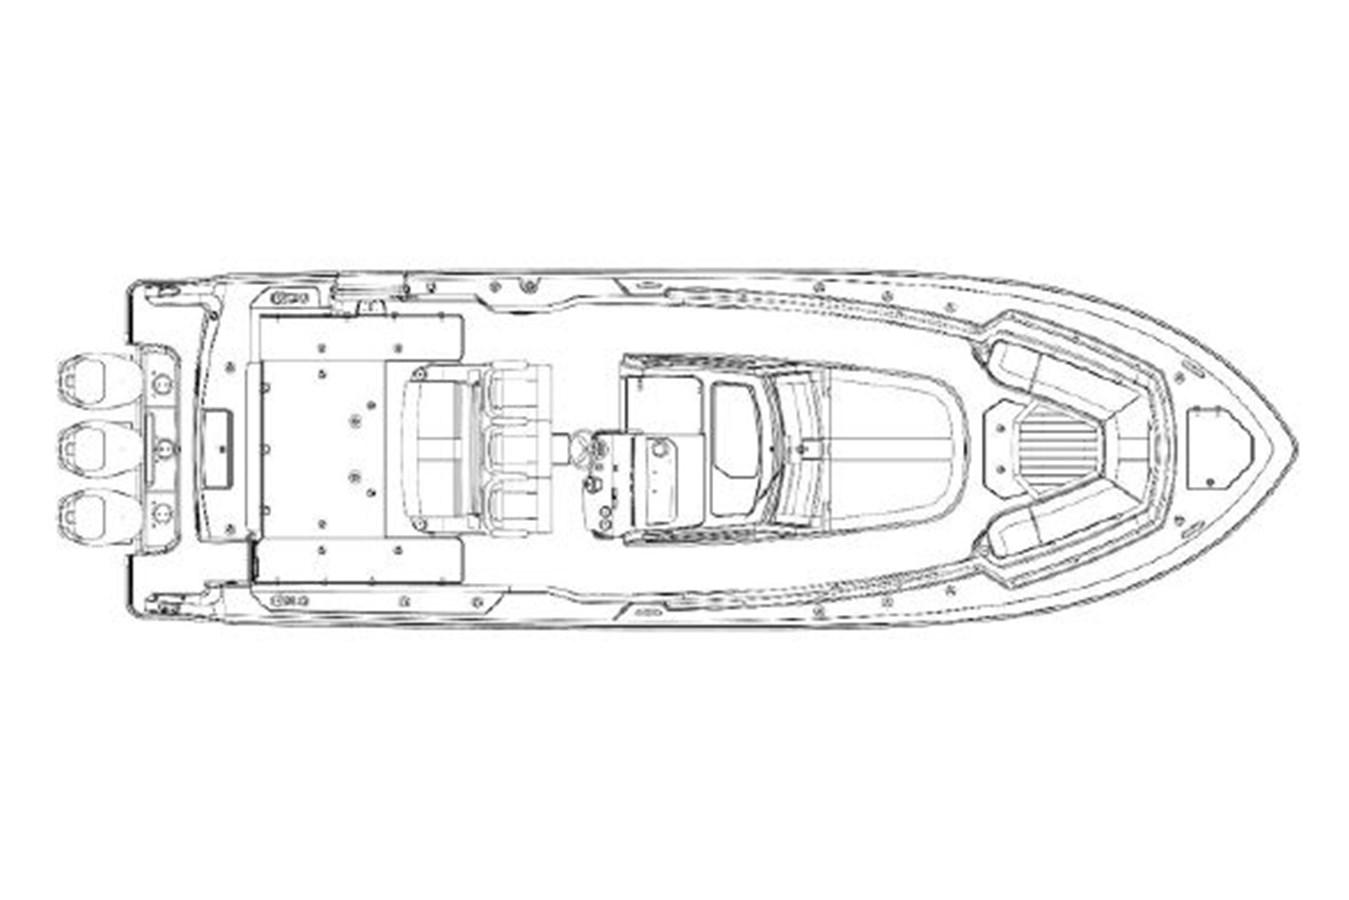 7256386_20191019113159241_1_XLARGE 2020 BOSTON WHALER  Deck Boat 2856389